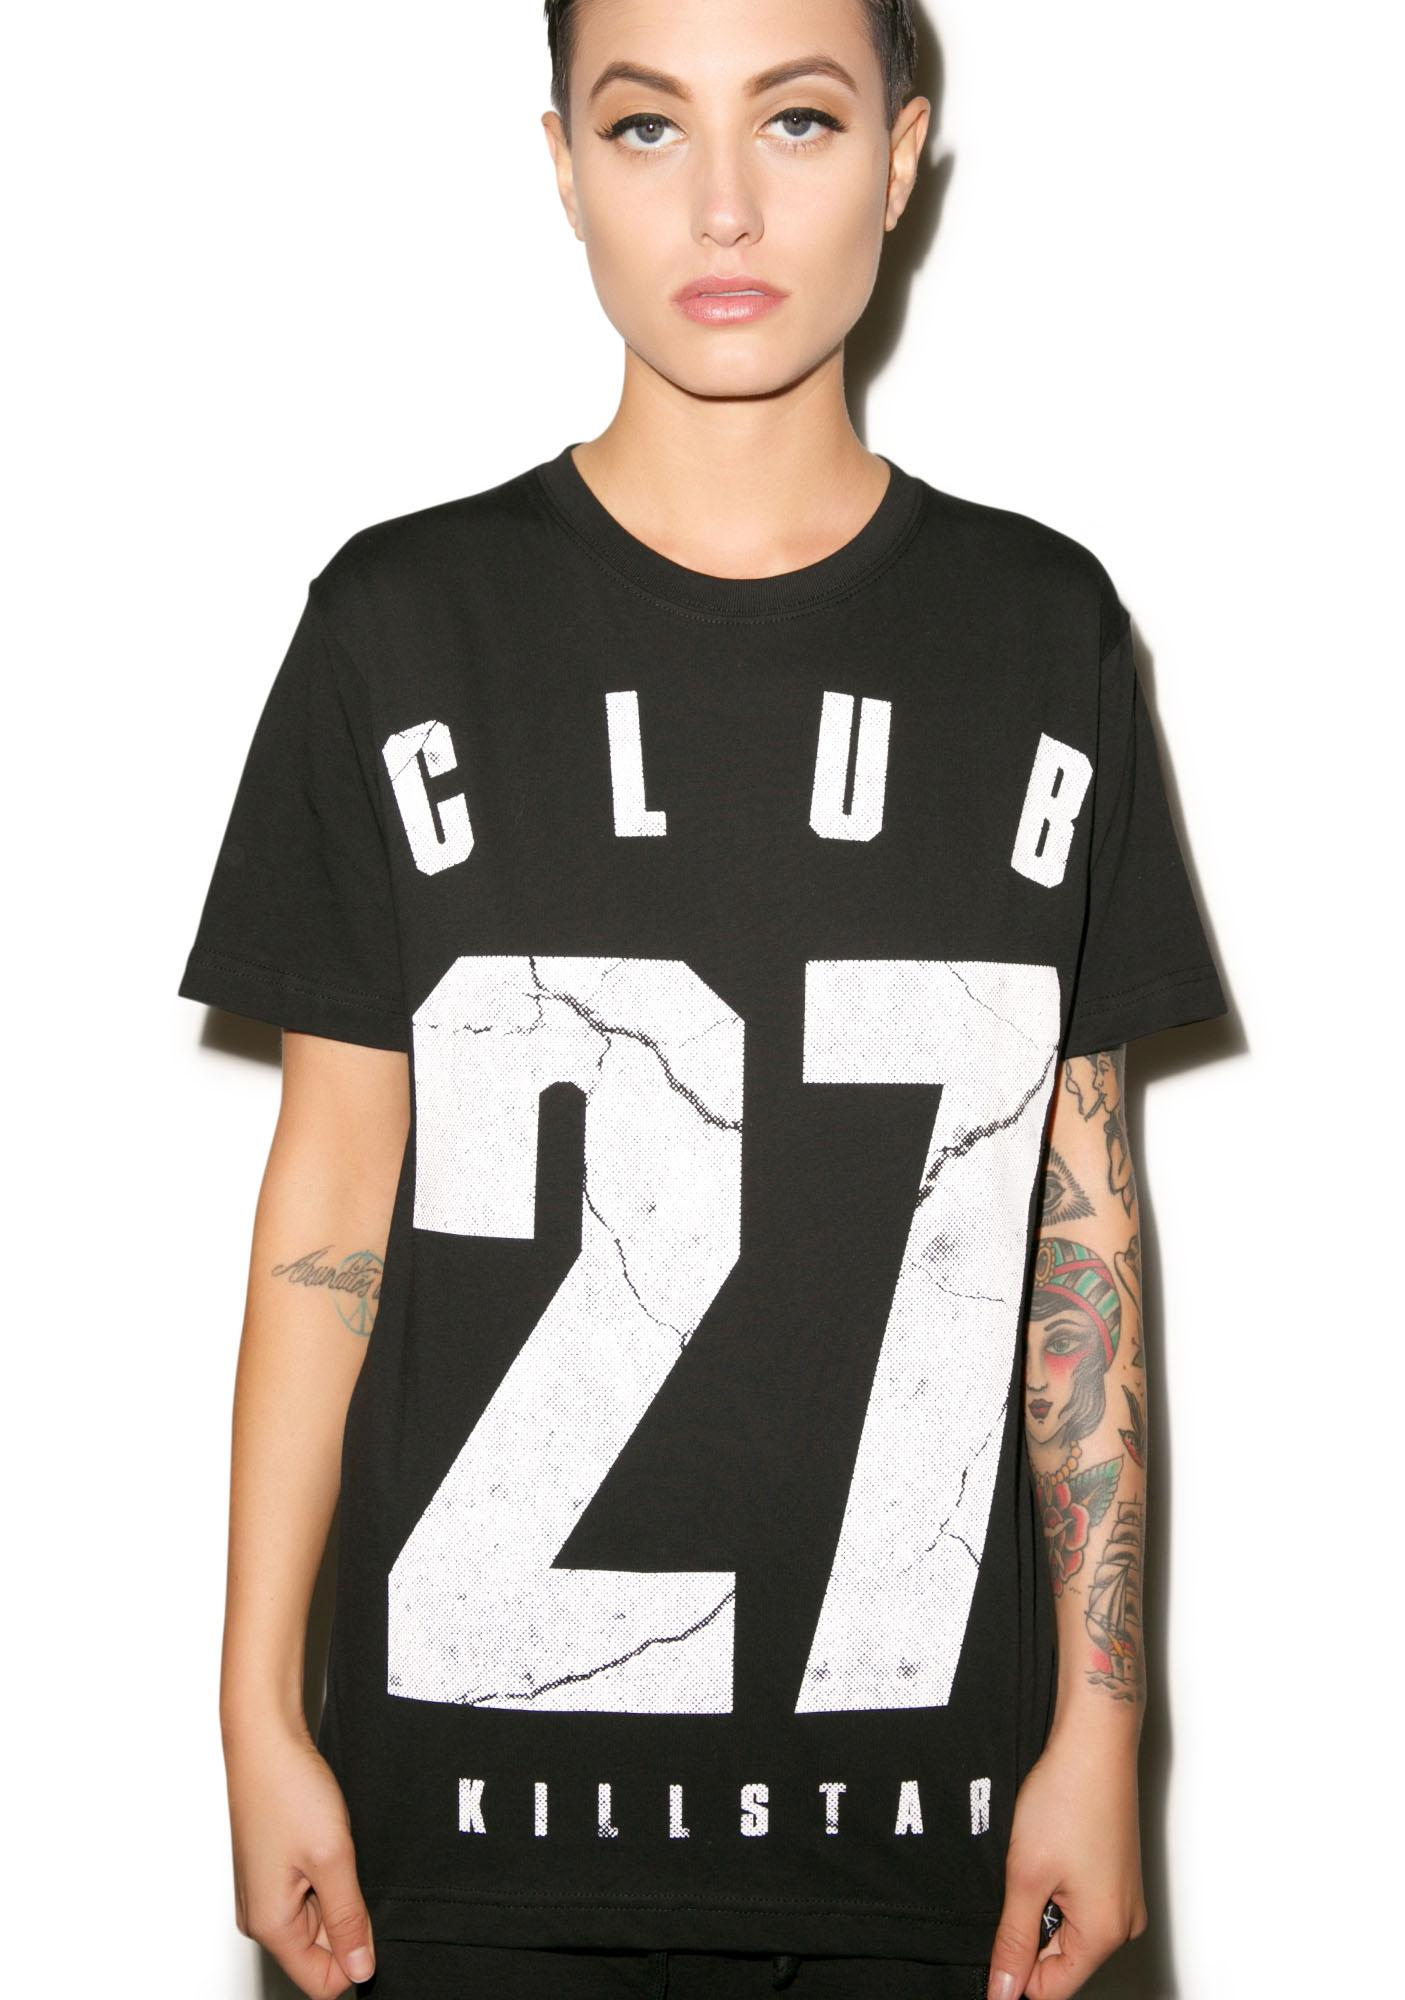 Killstar Club 27 Tee